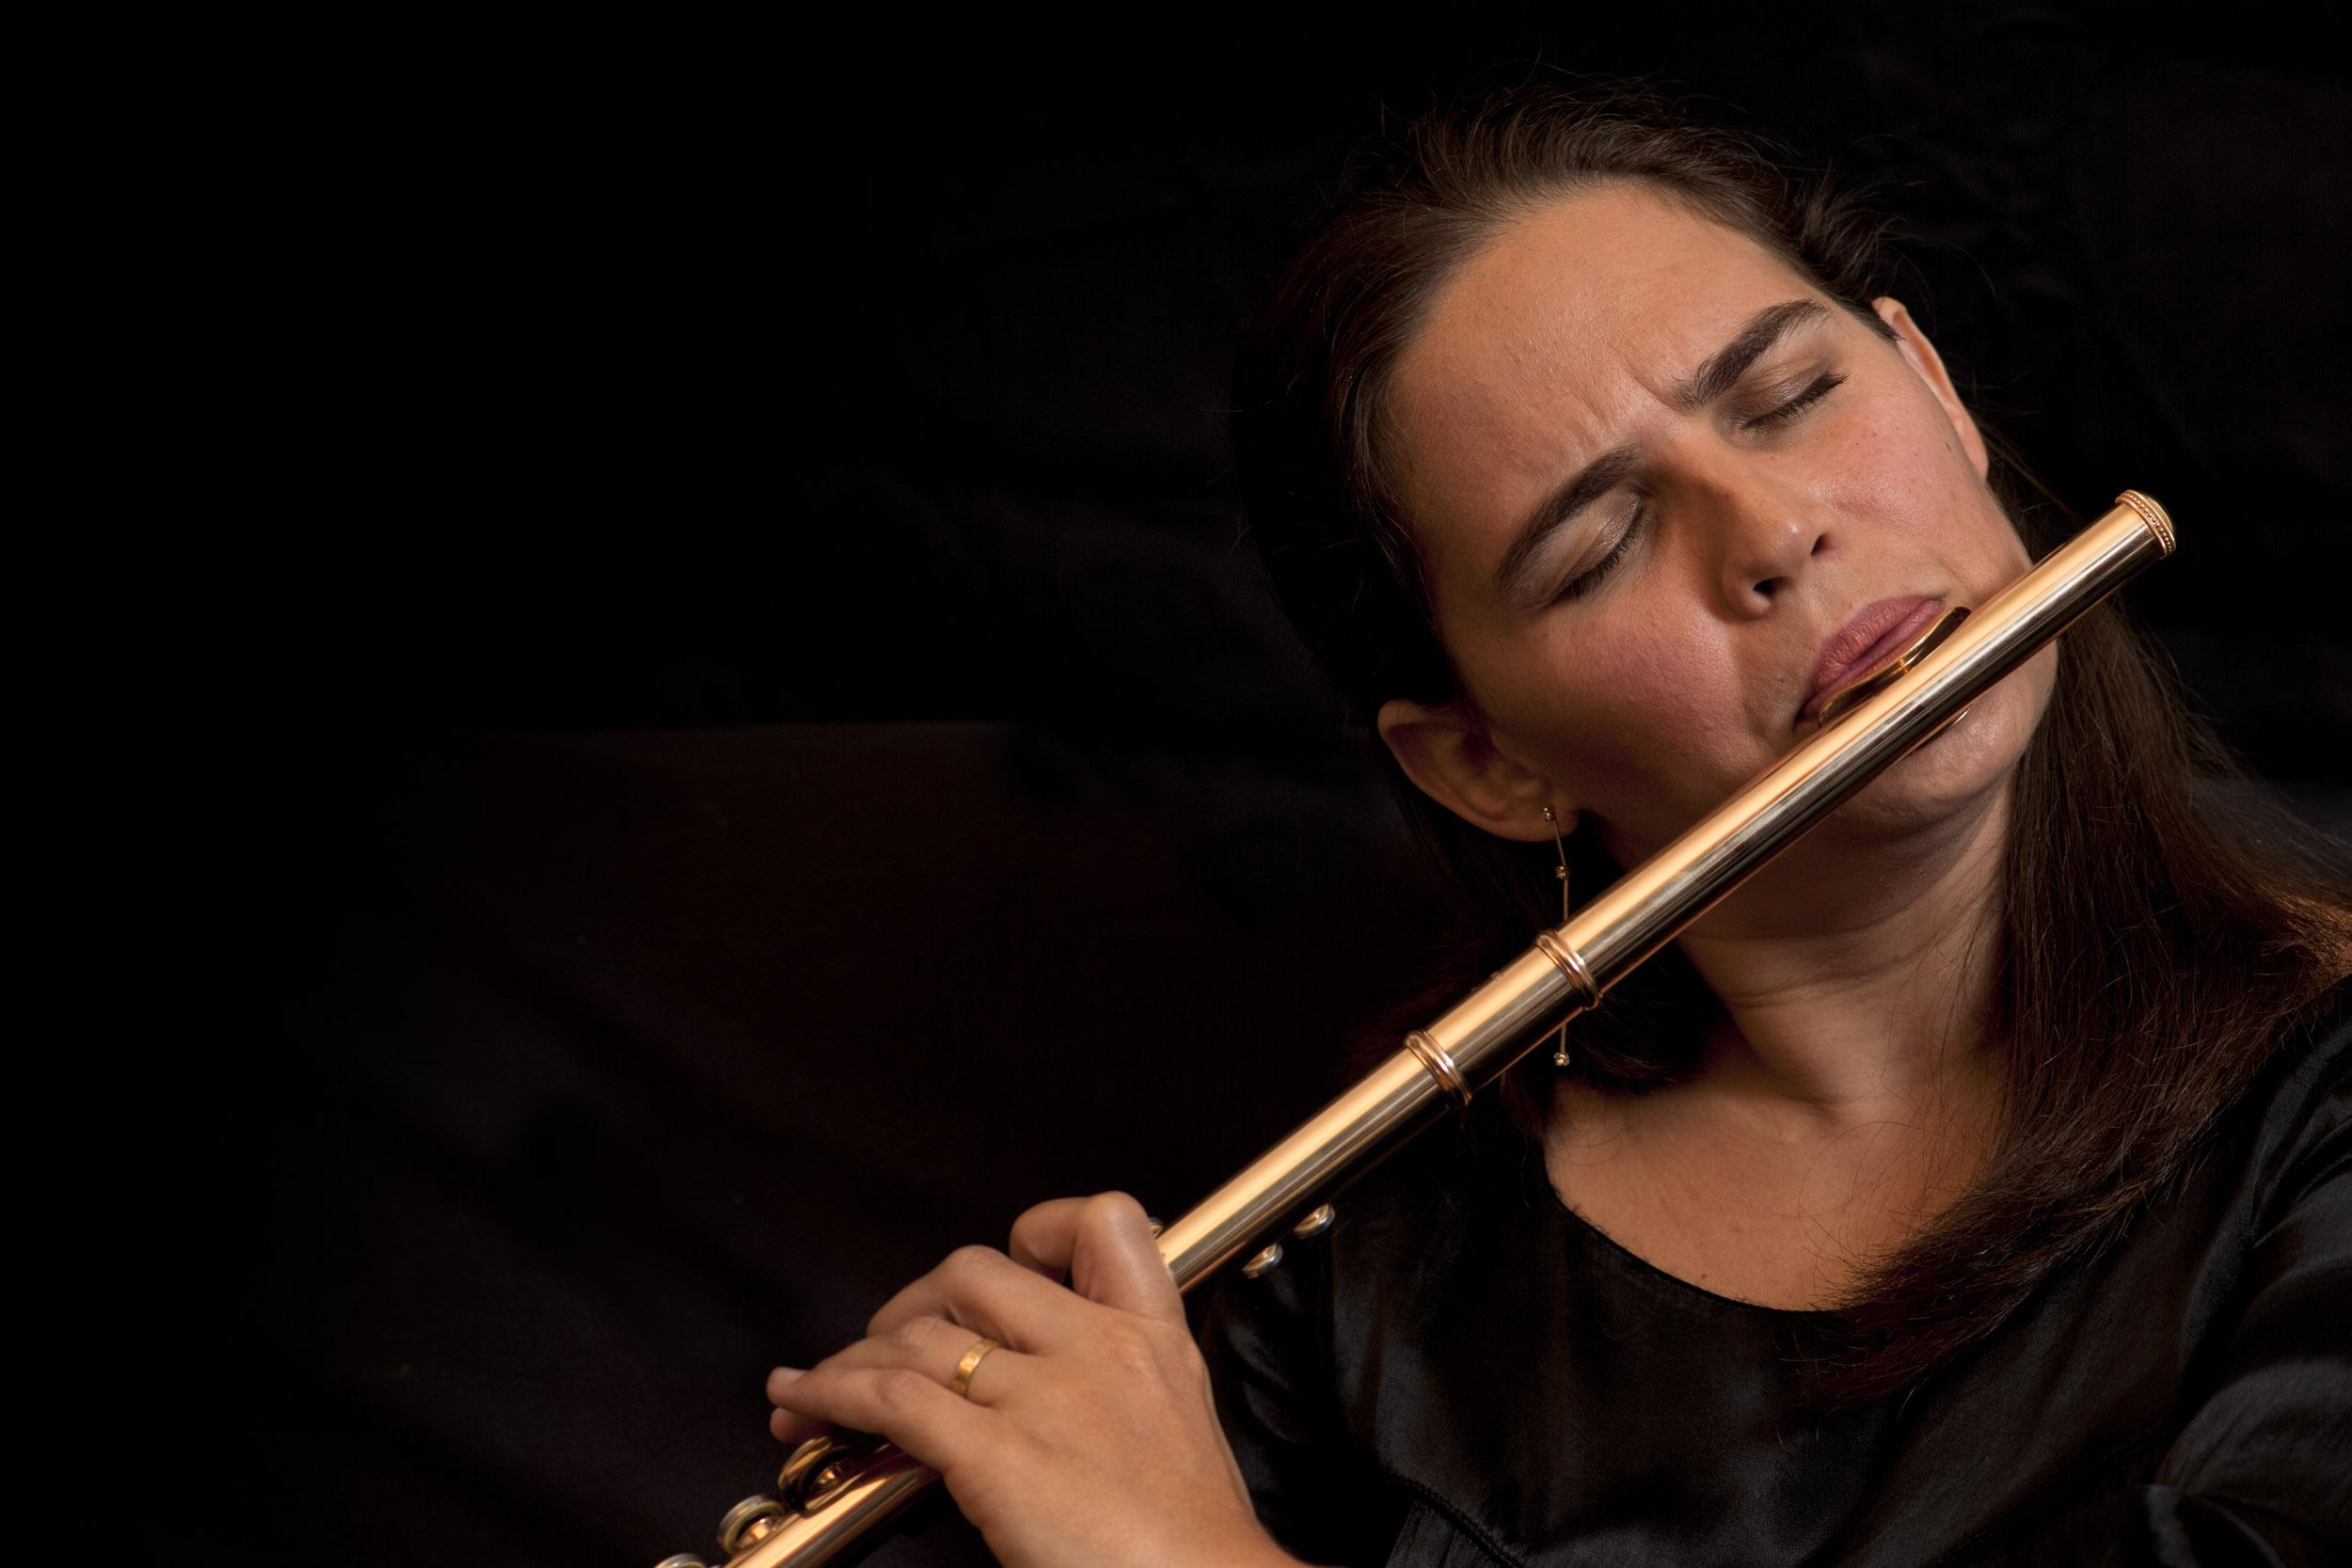 Niurka González, musician - Illuminated Cuba - Hector Garrido, Aerial and human photography